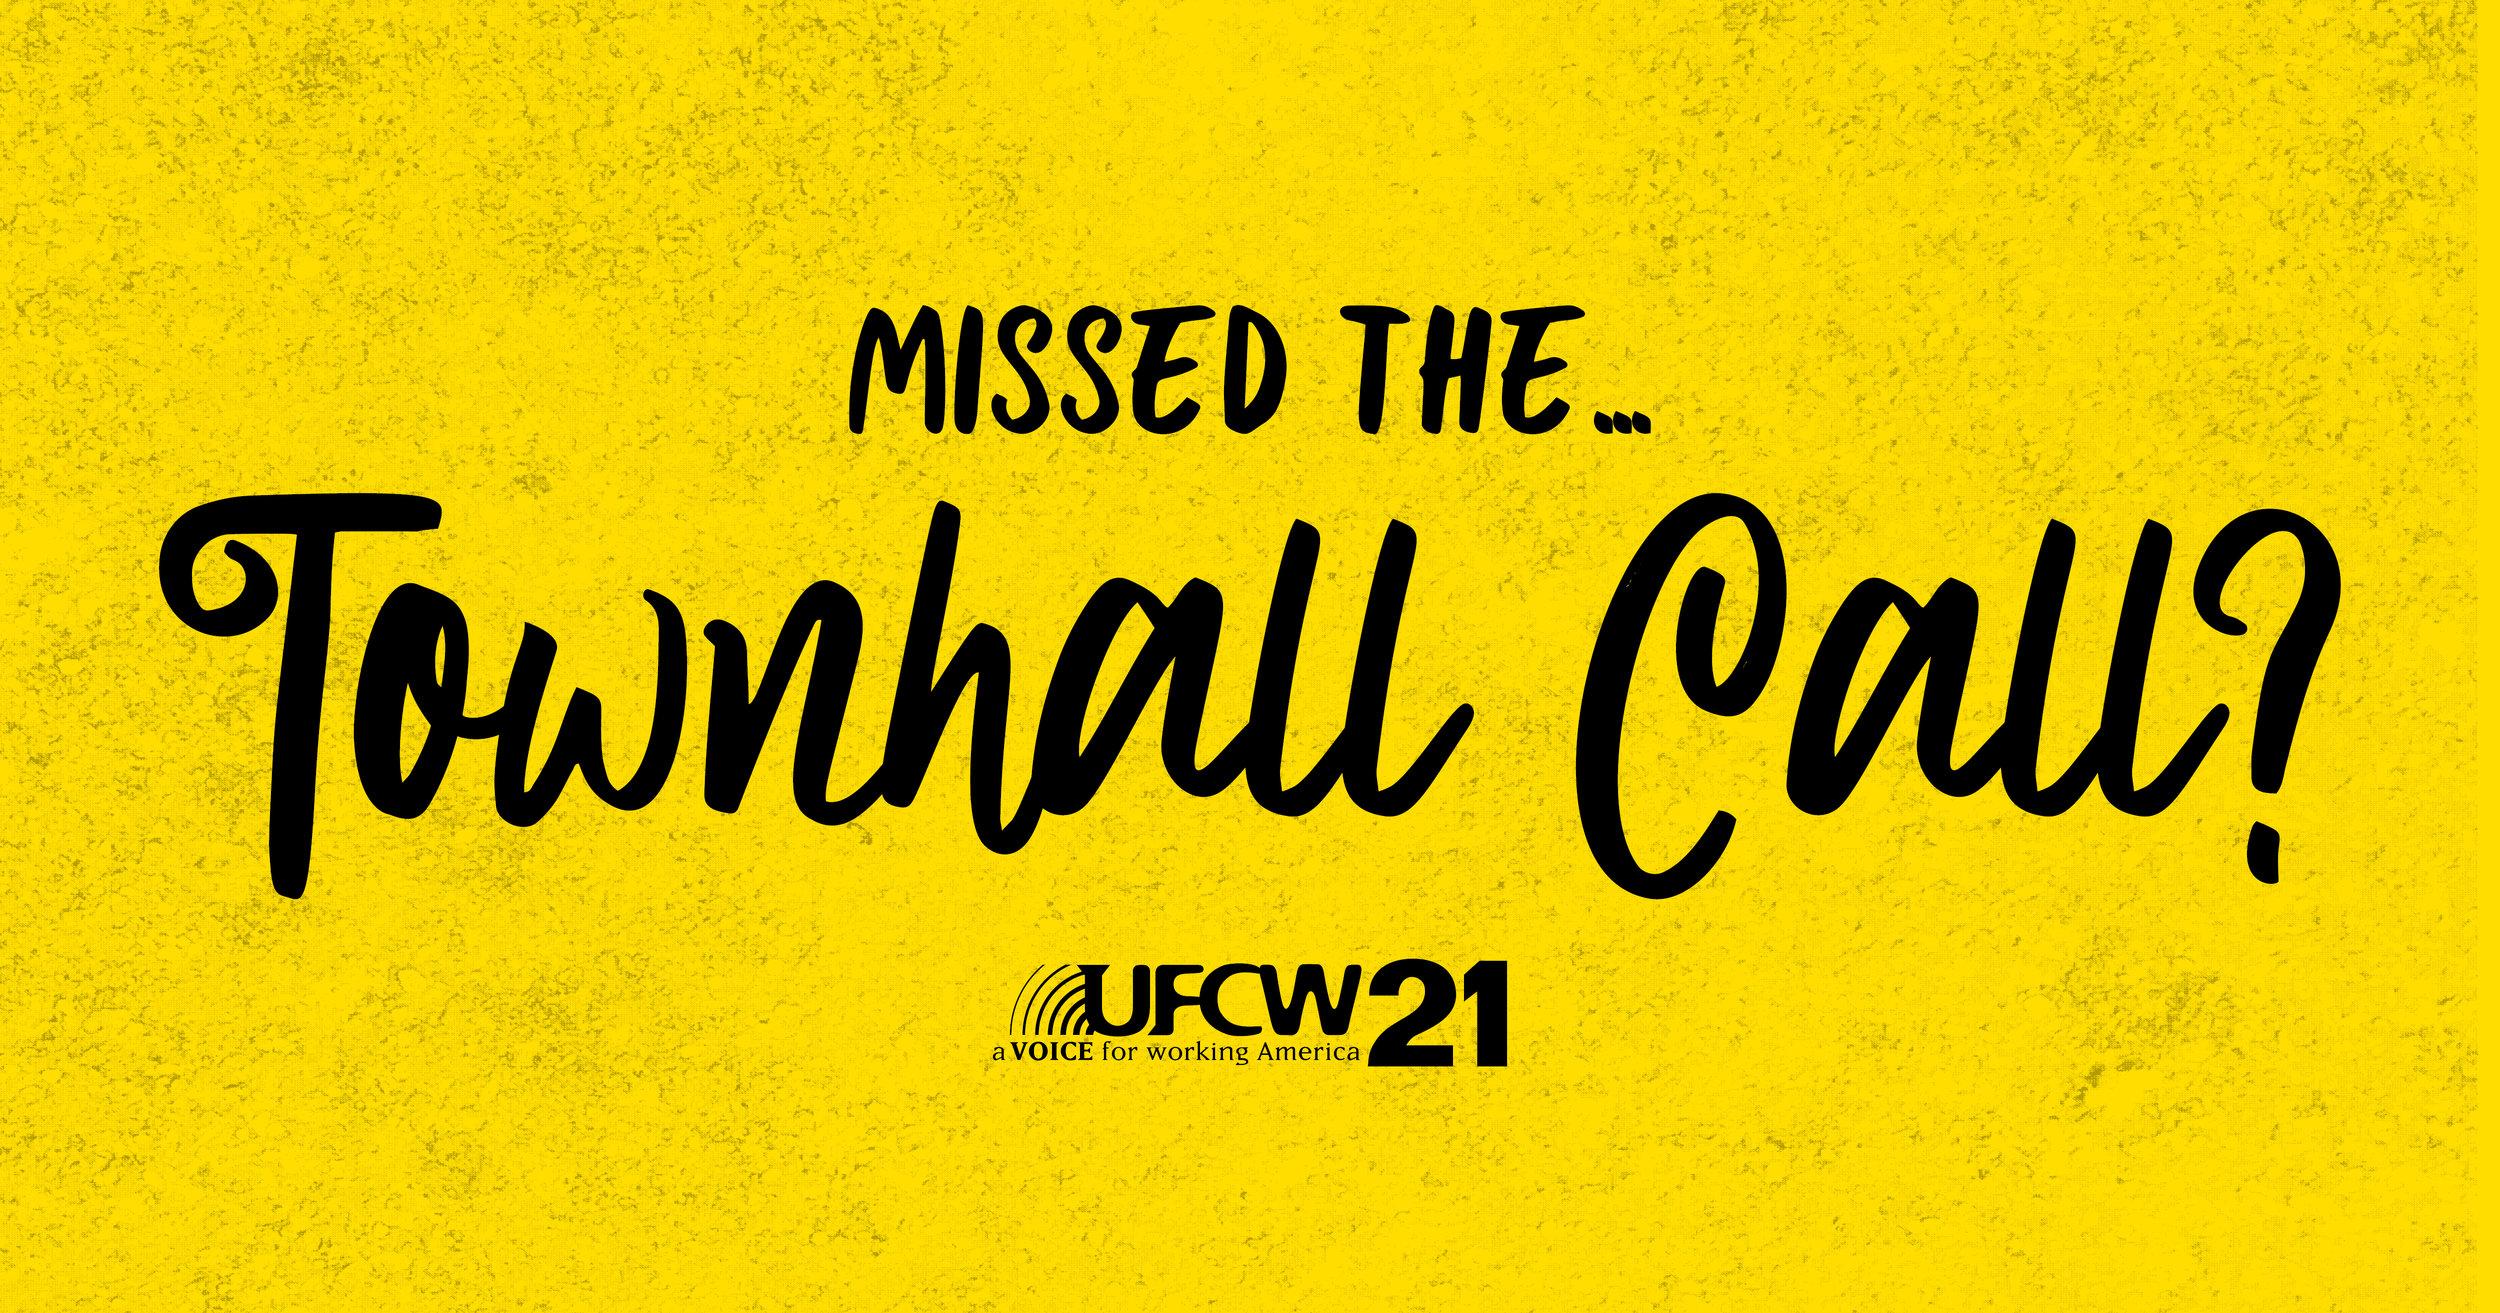 2018 0108 - townhall call 3.jpg